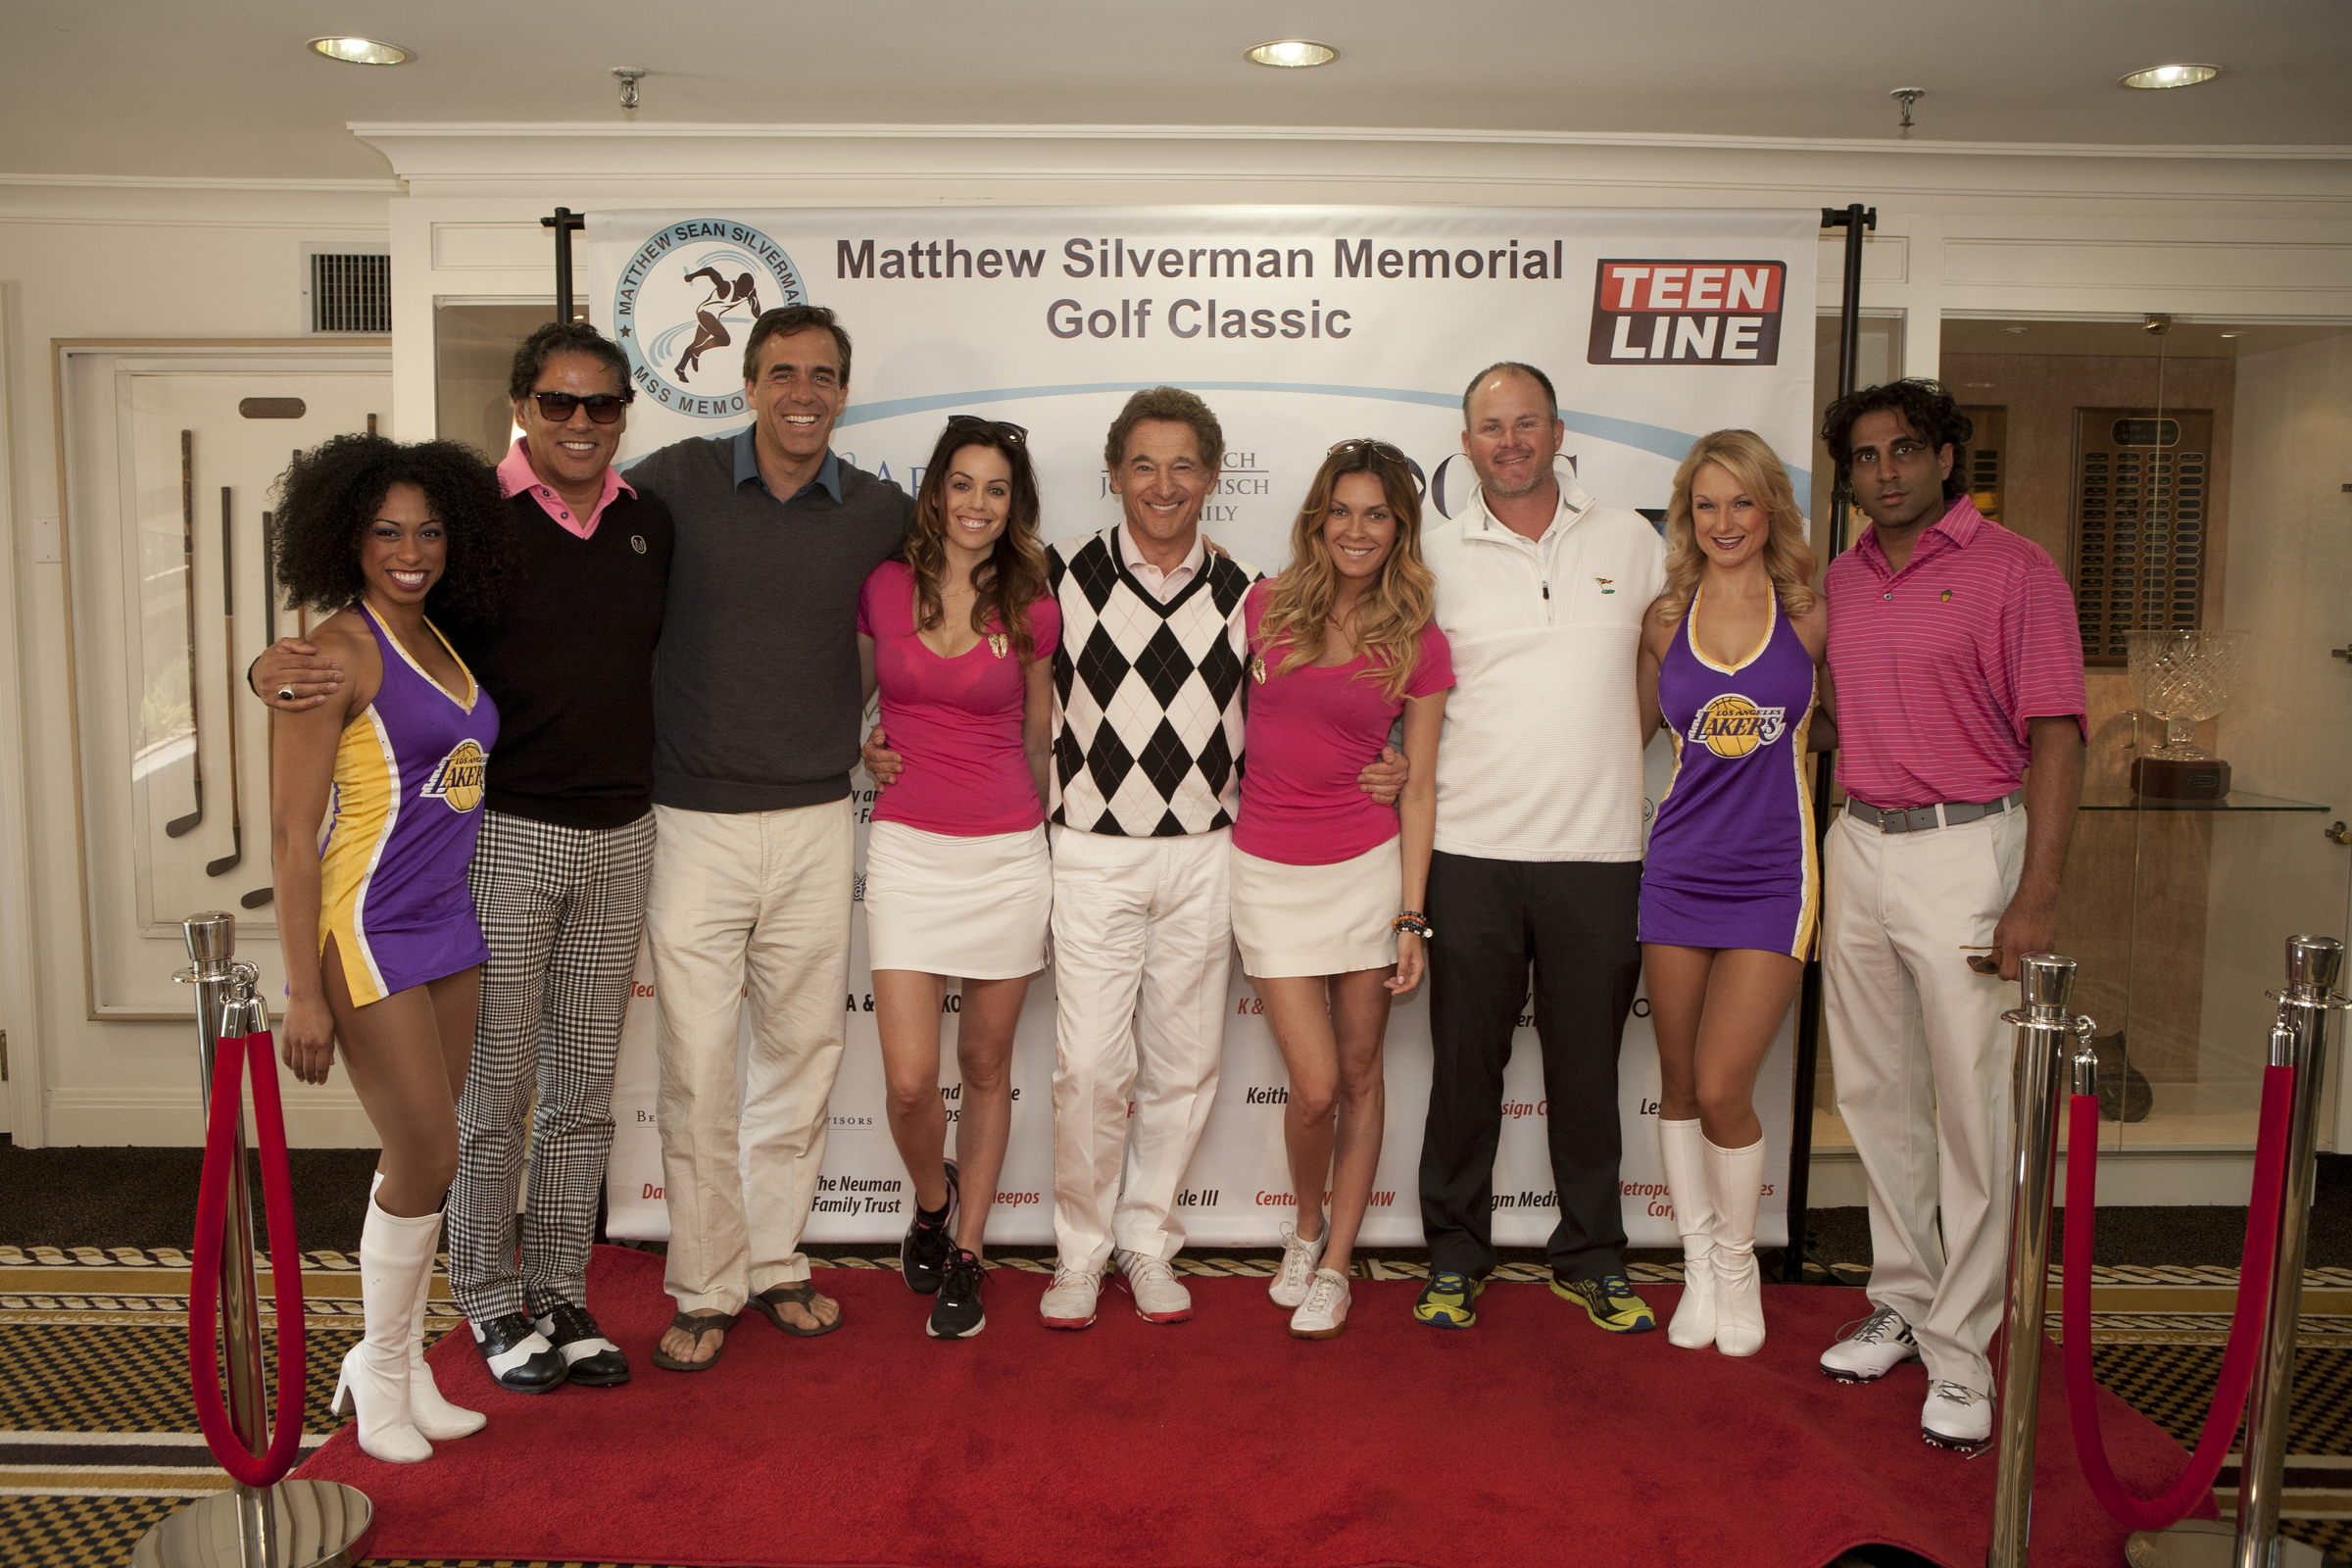 IMG_7244MSM_golf_event.JPG